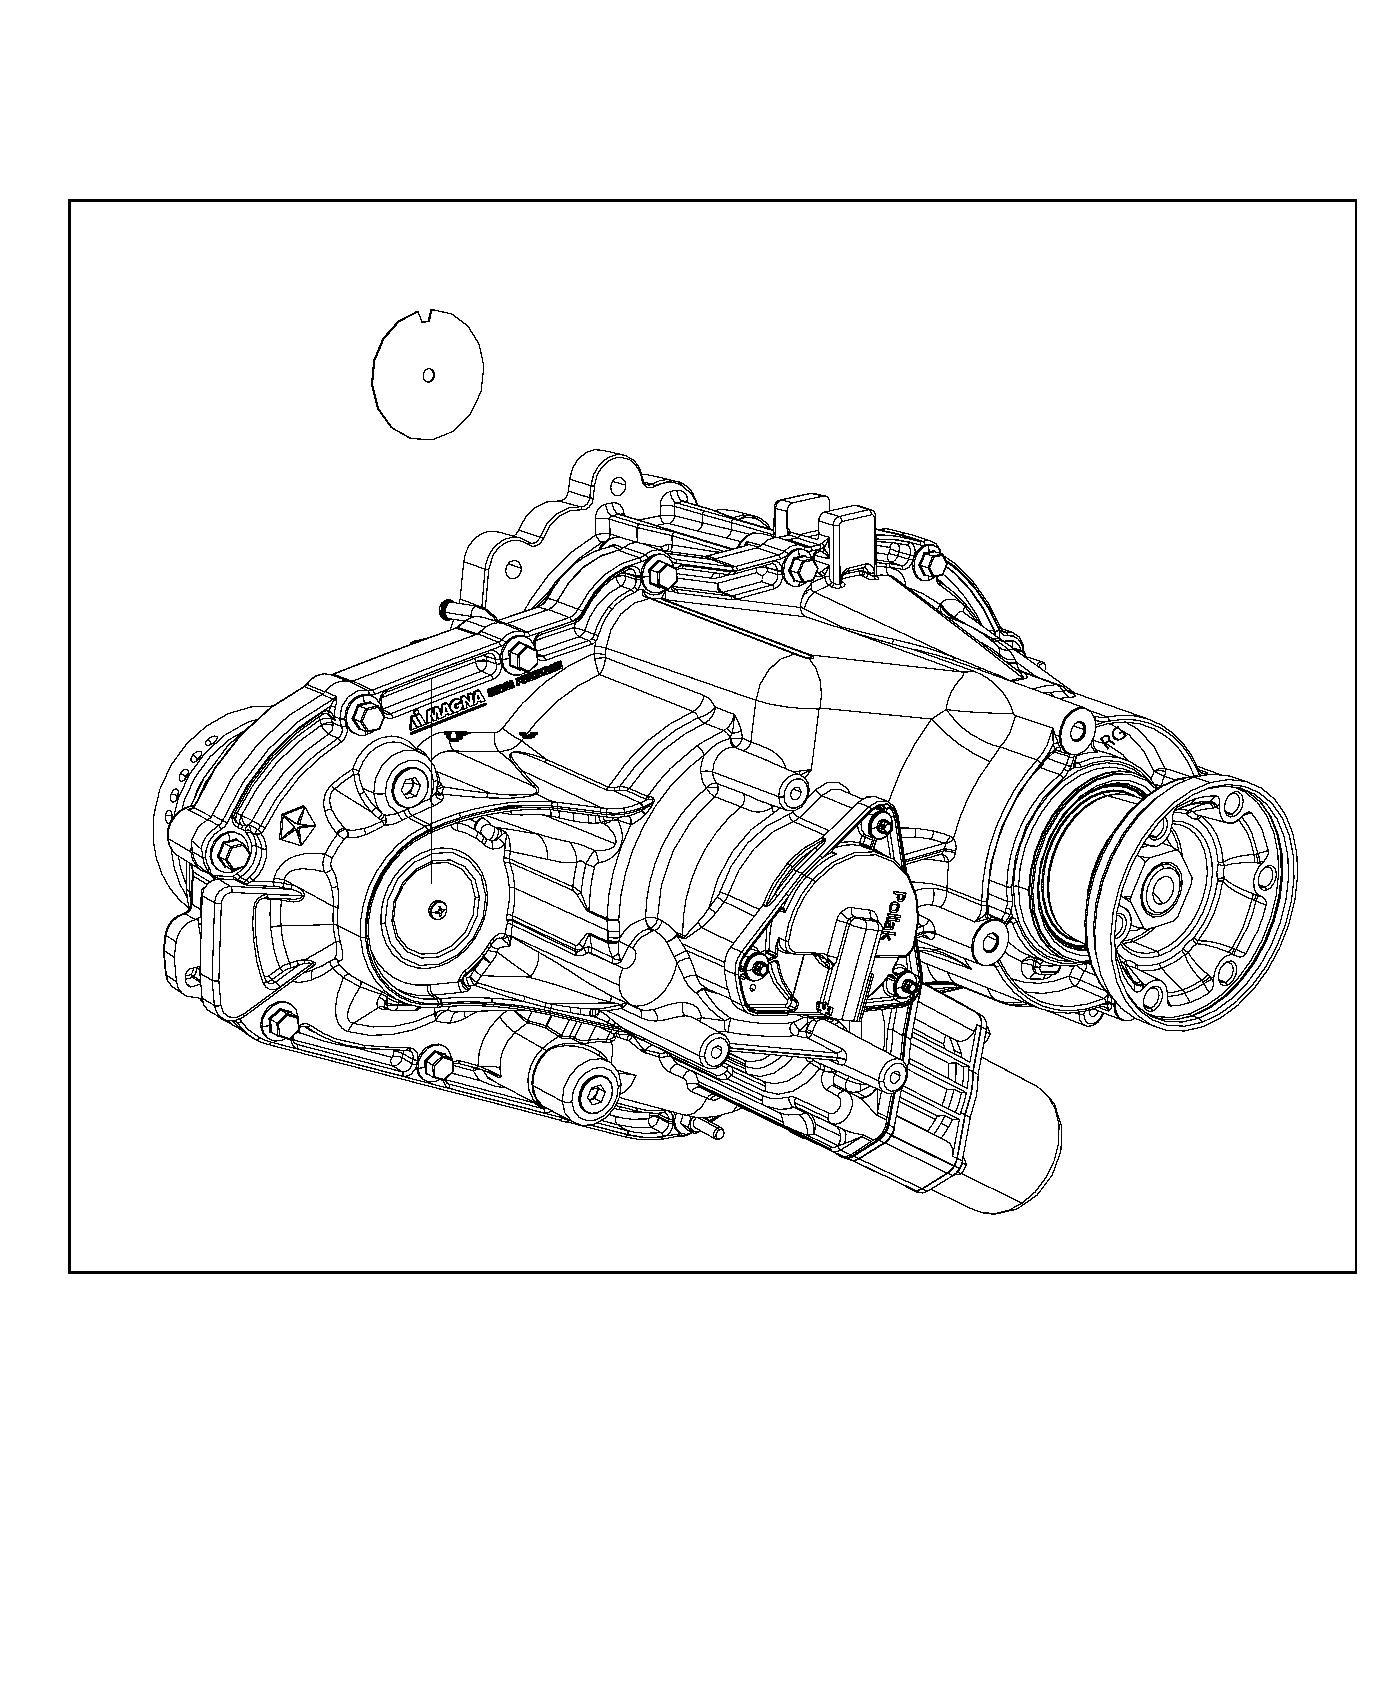 Jeep Grand Cherokee Transfer Case